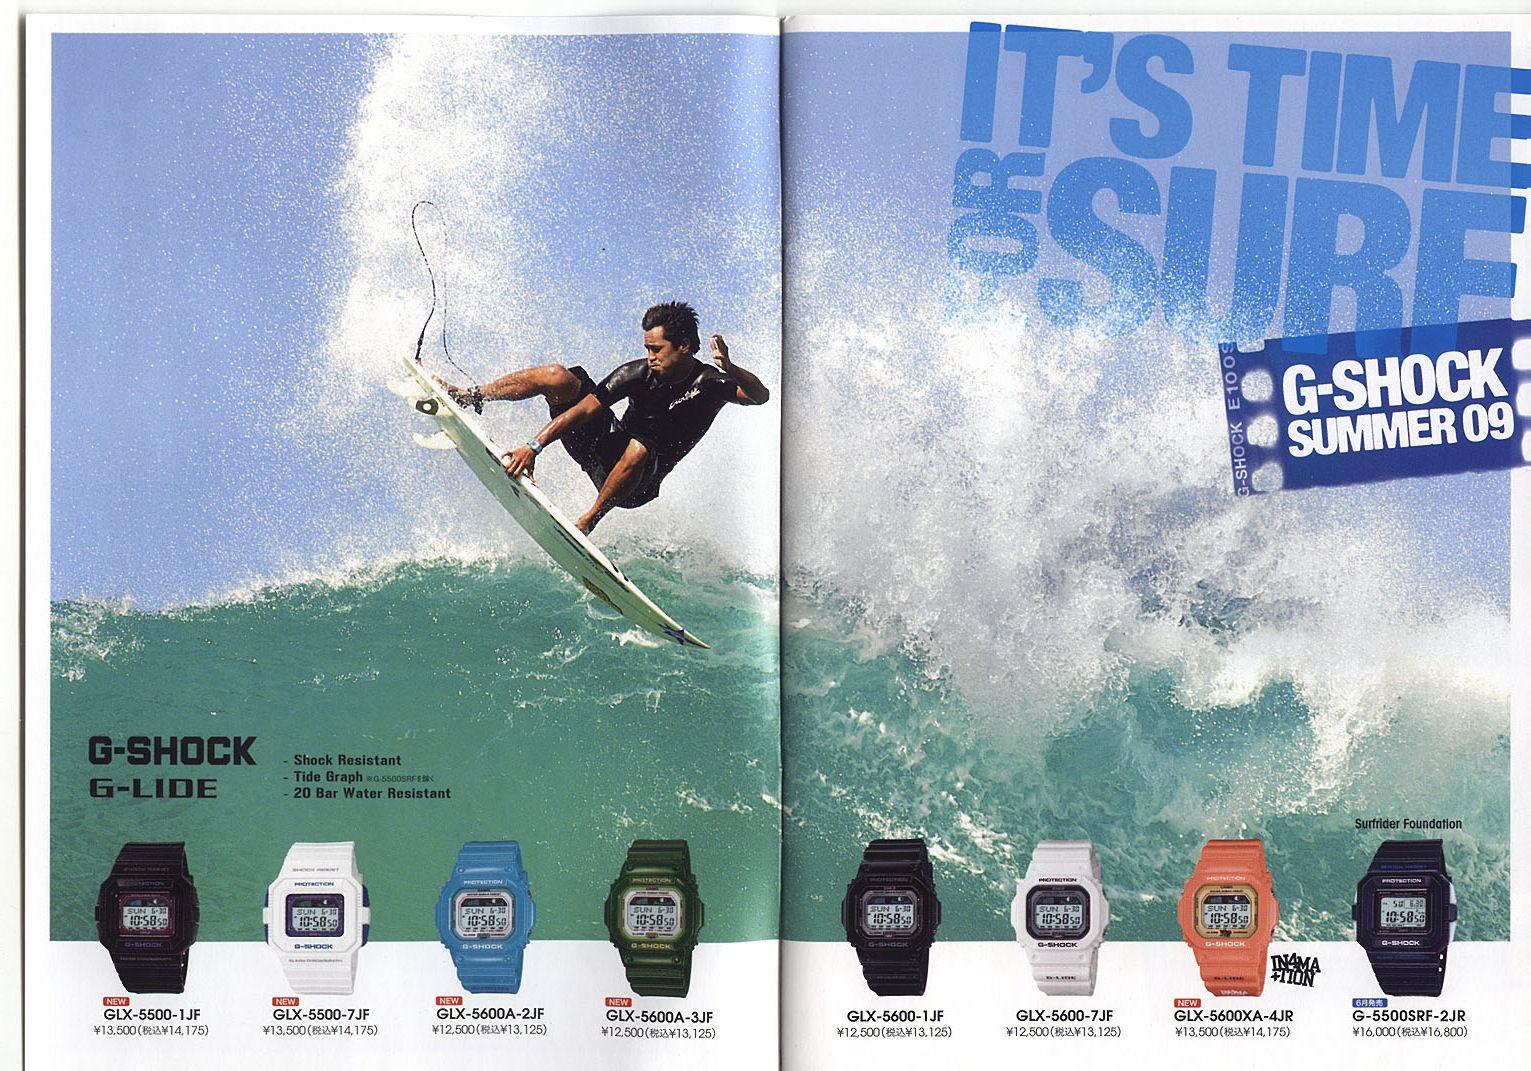 Casio-G-Shock-Surf-Collection-Summer-2009-Page-2.jpg